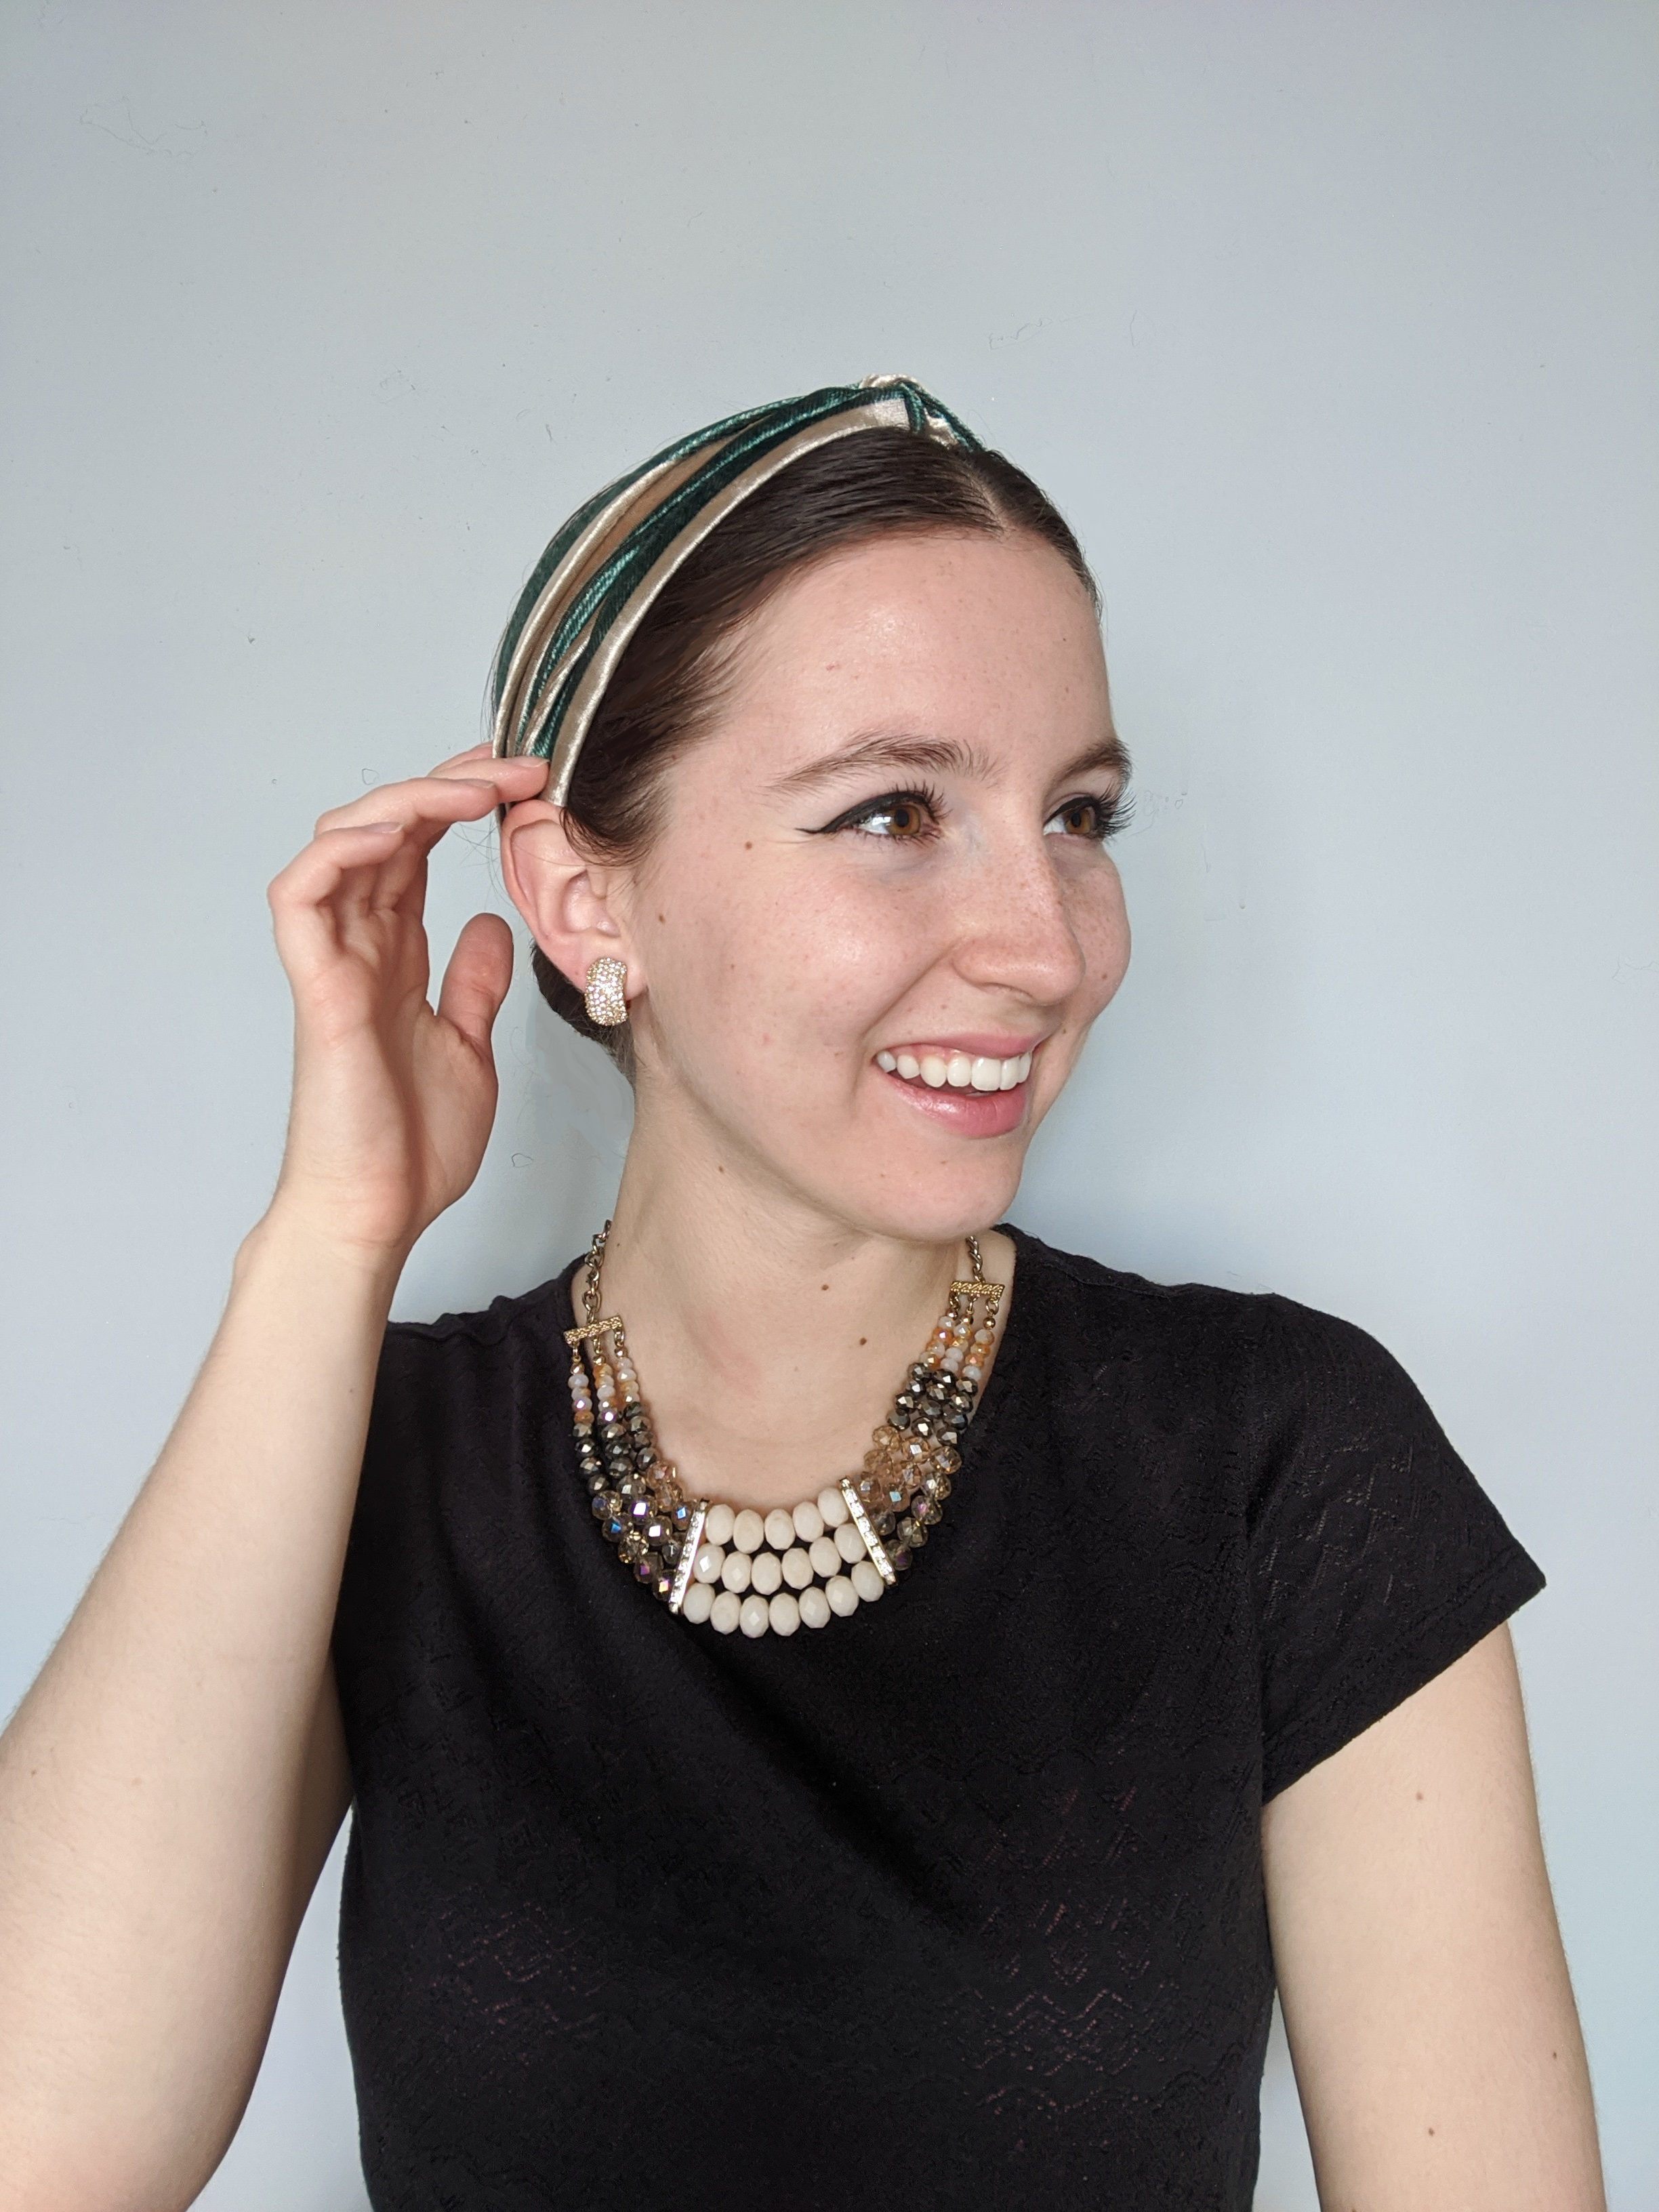 hairwashing, trendy headbands, washing your hair, green headband